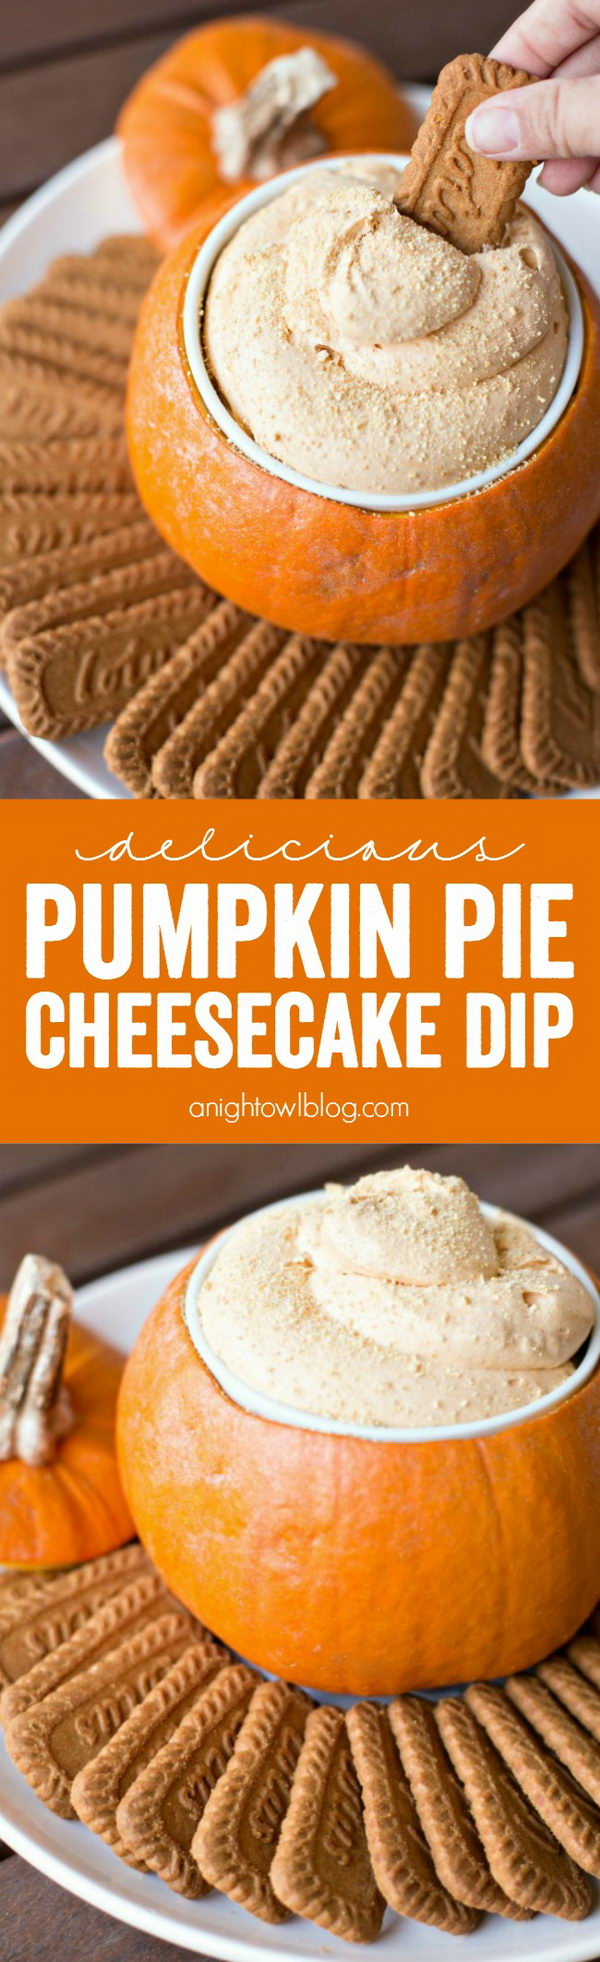 Pumpkin Pie Cheesecake Dip.